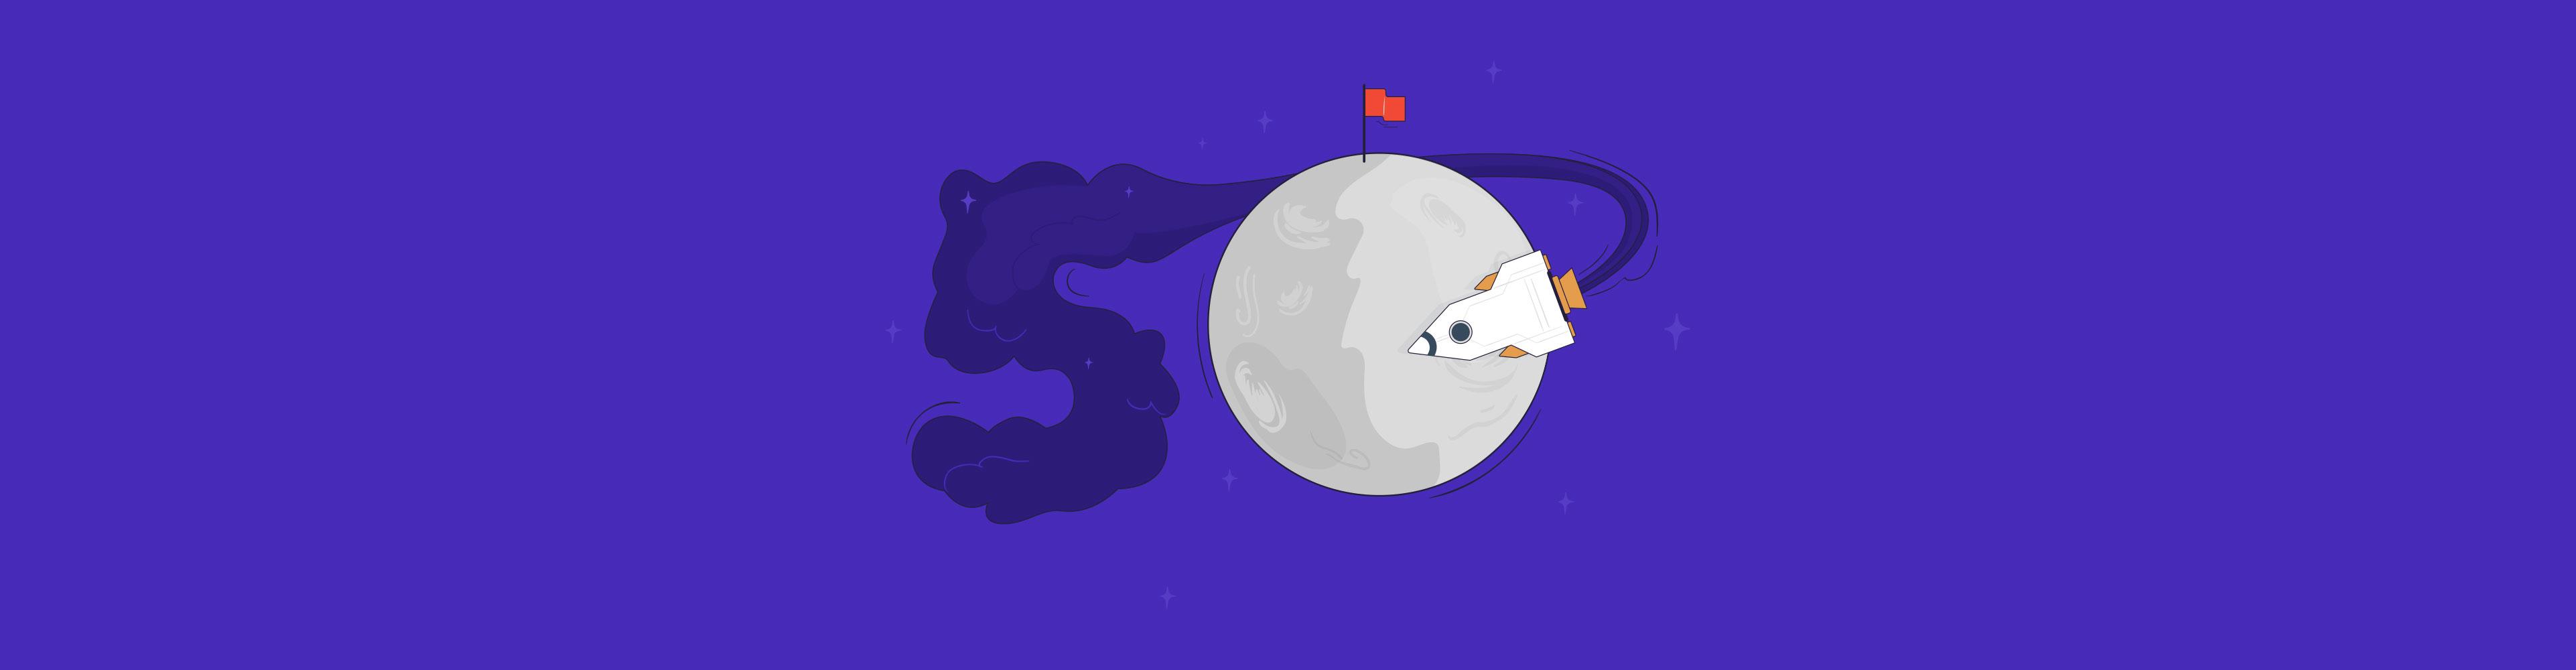 50th anniversary moon landing